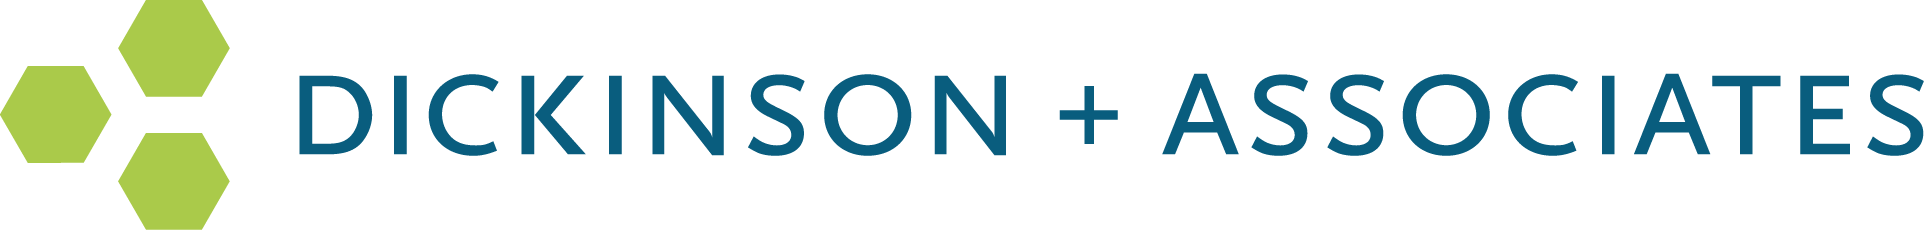 Dickinson + Associates Logo